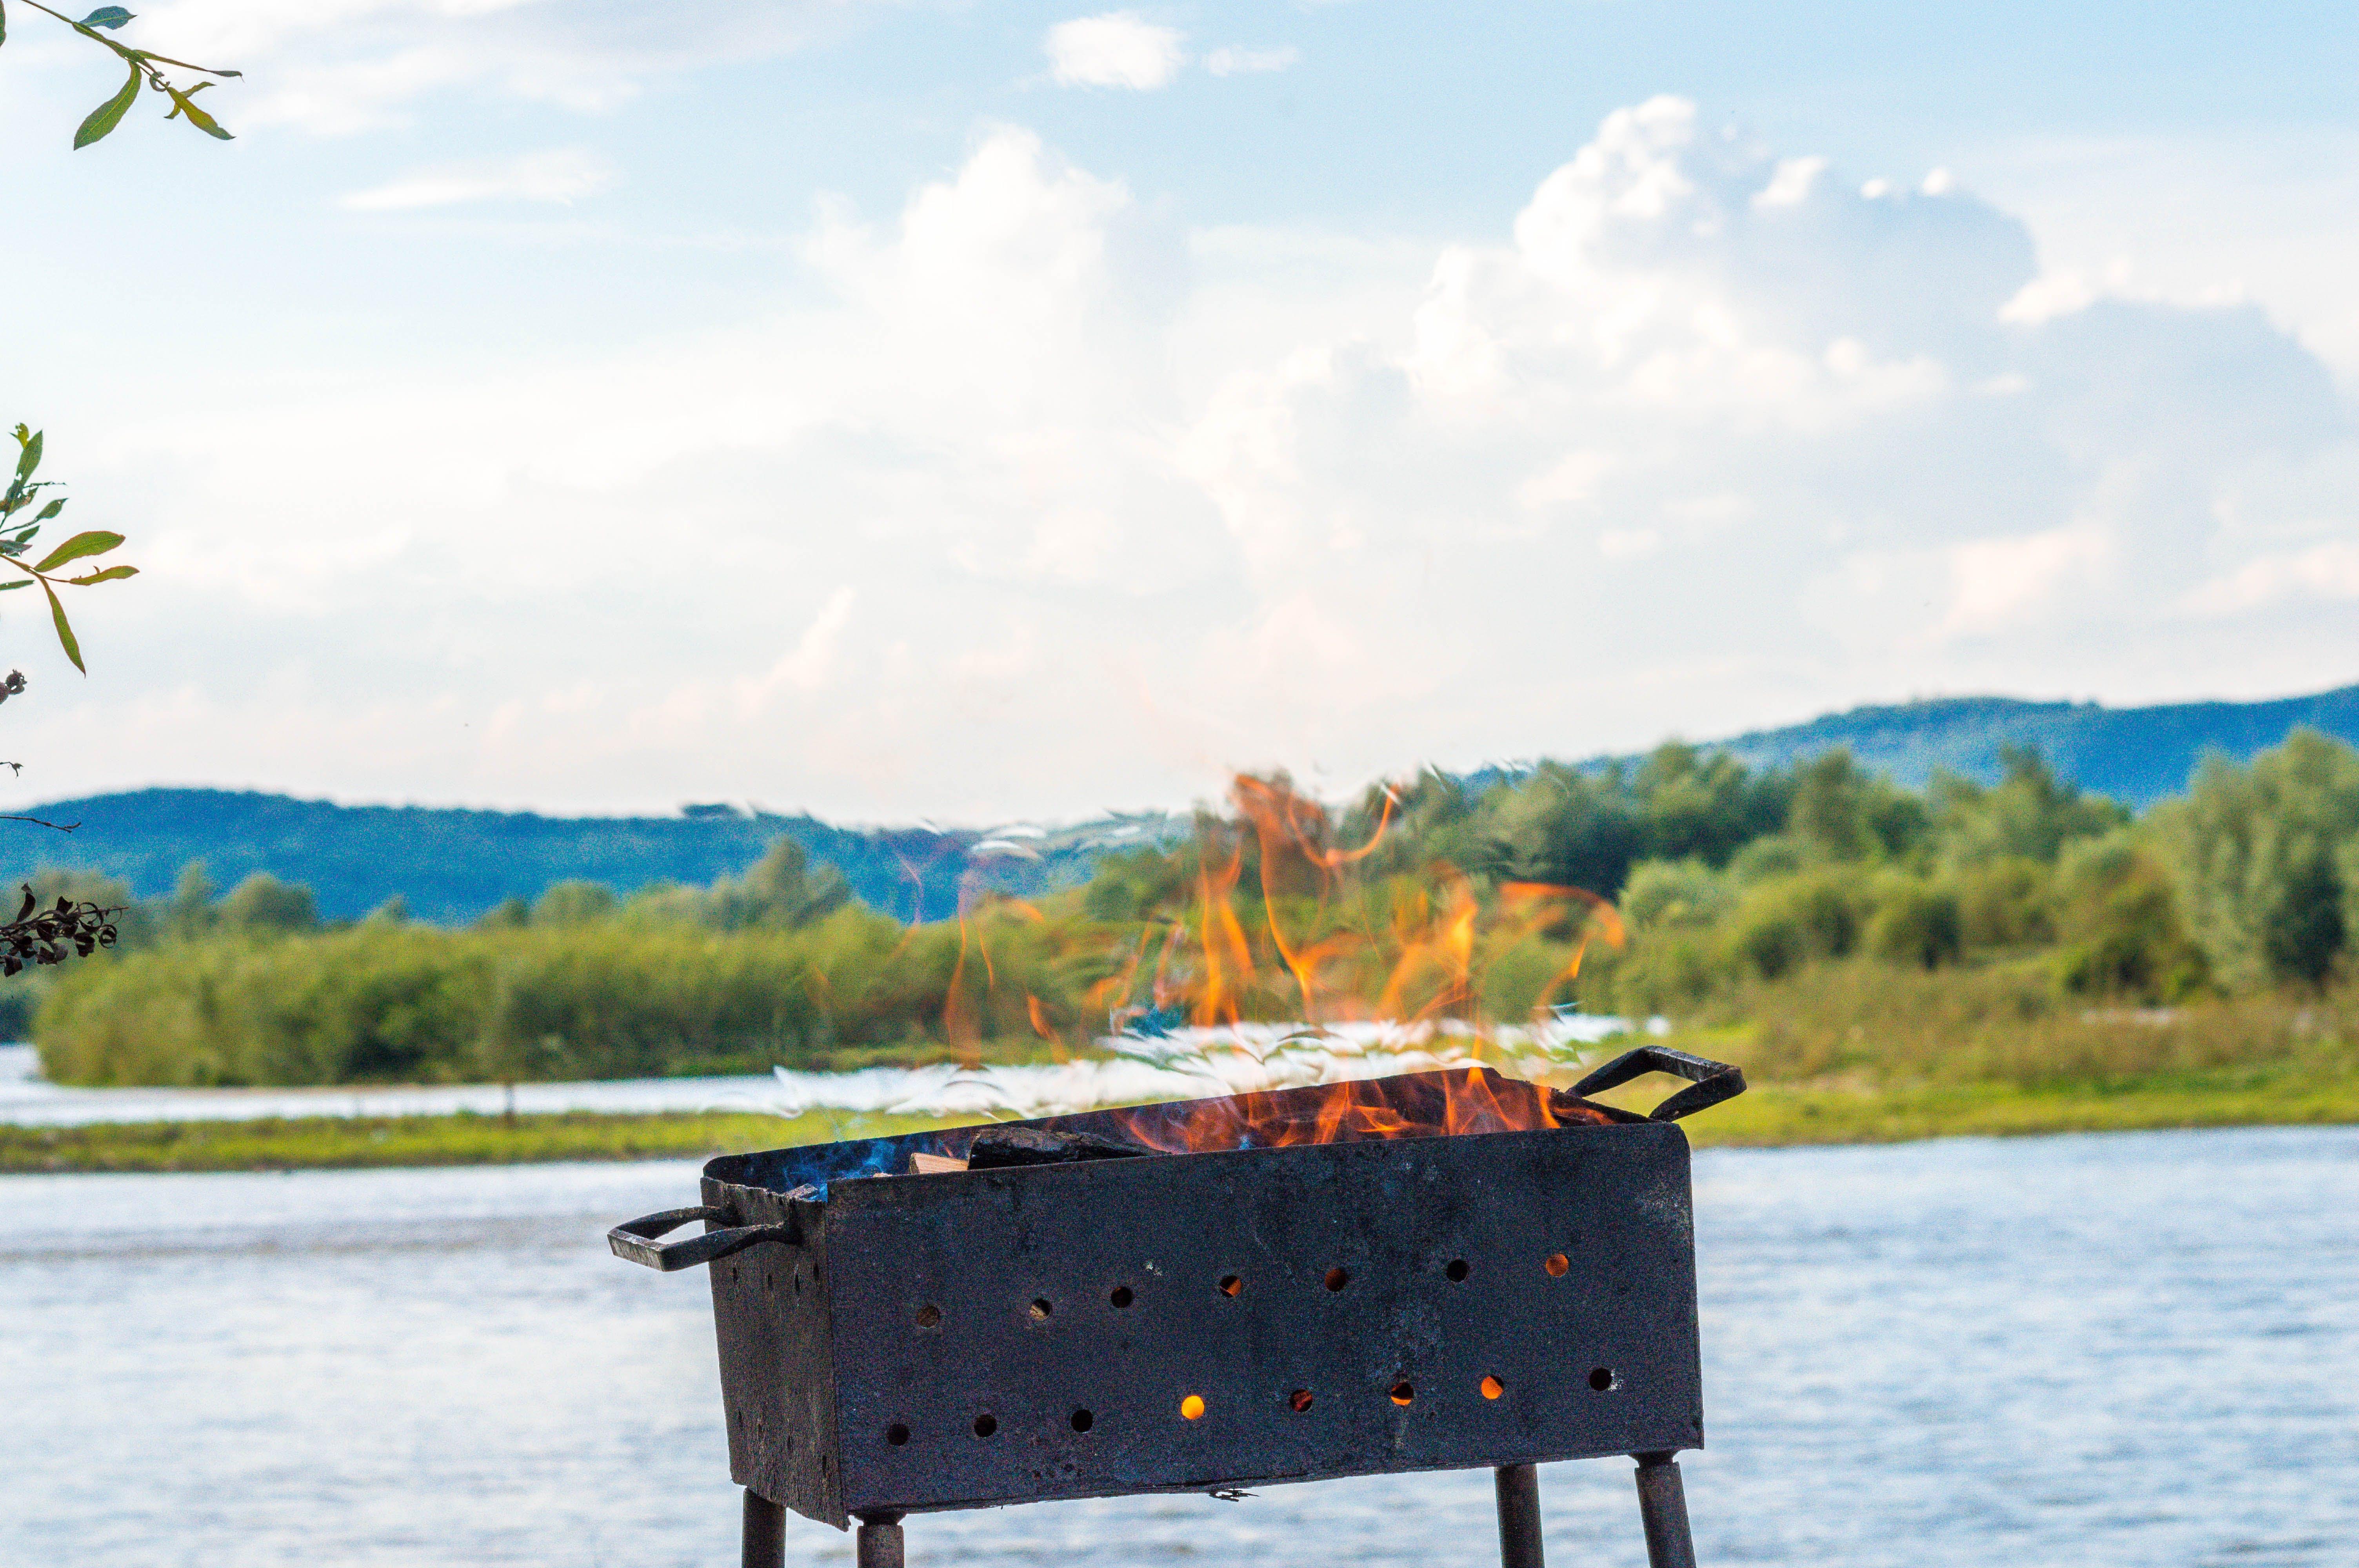 Rectangular Black Metal Lighted Fire Pit Near River